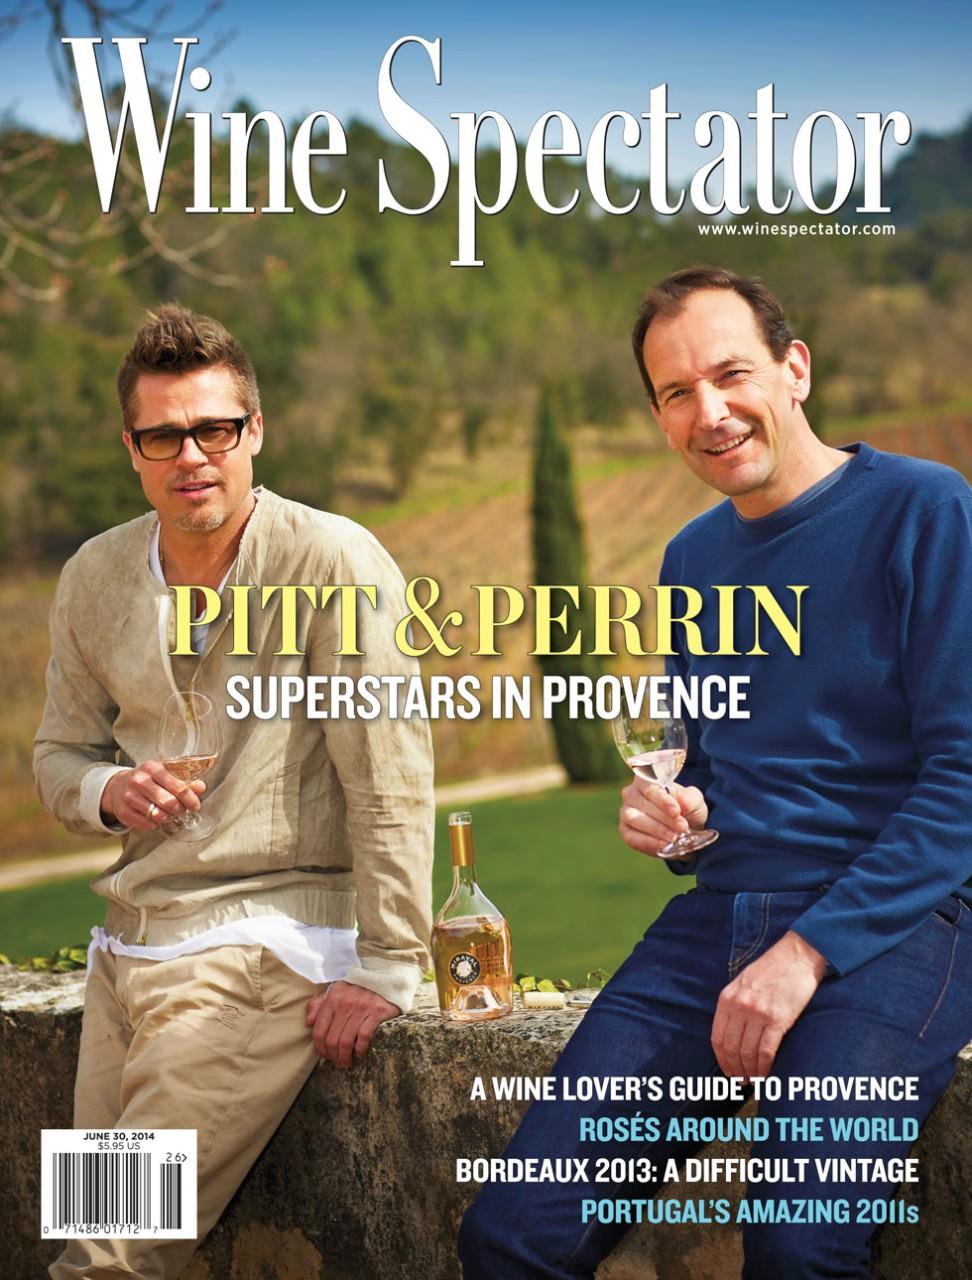 brad pitt wine spectator cover.jpg.CROP.cq5dam web 1280 1280 jpeg